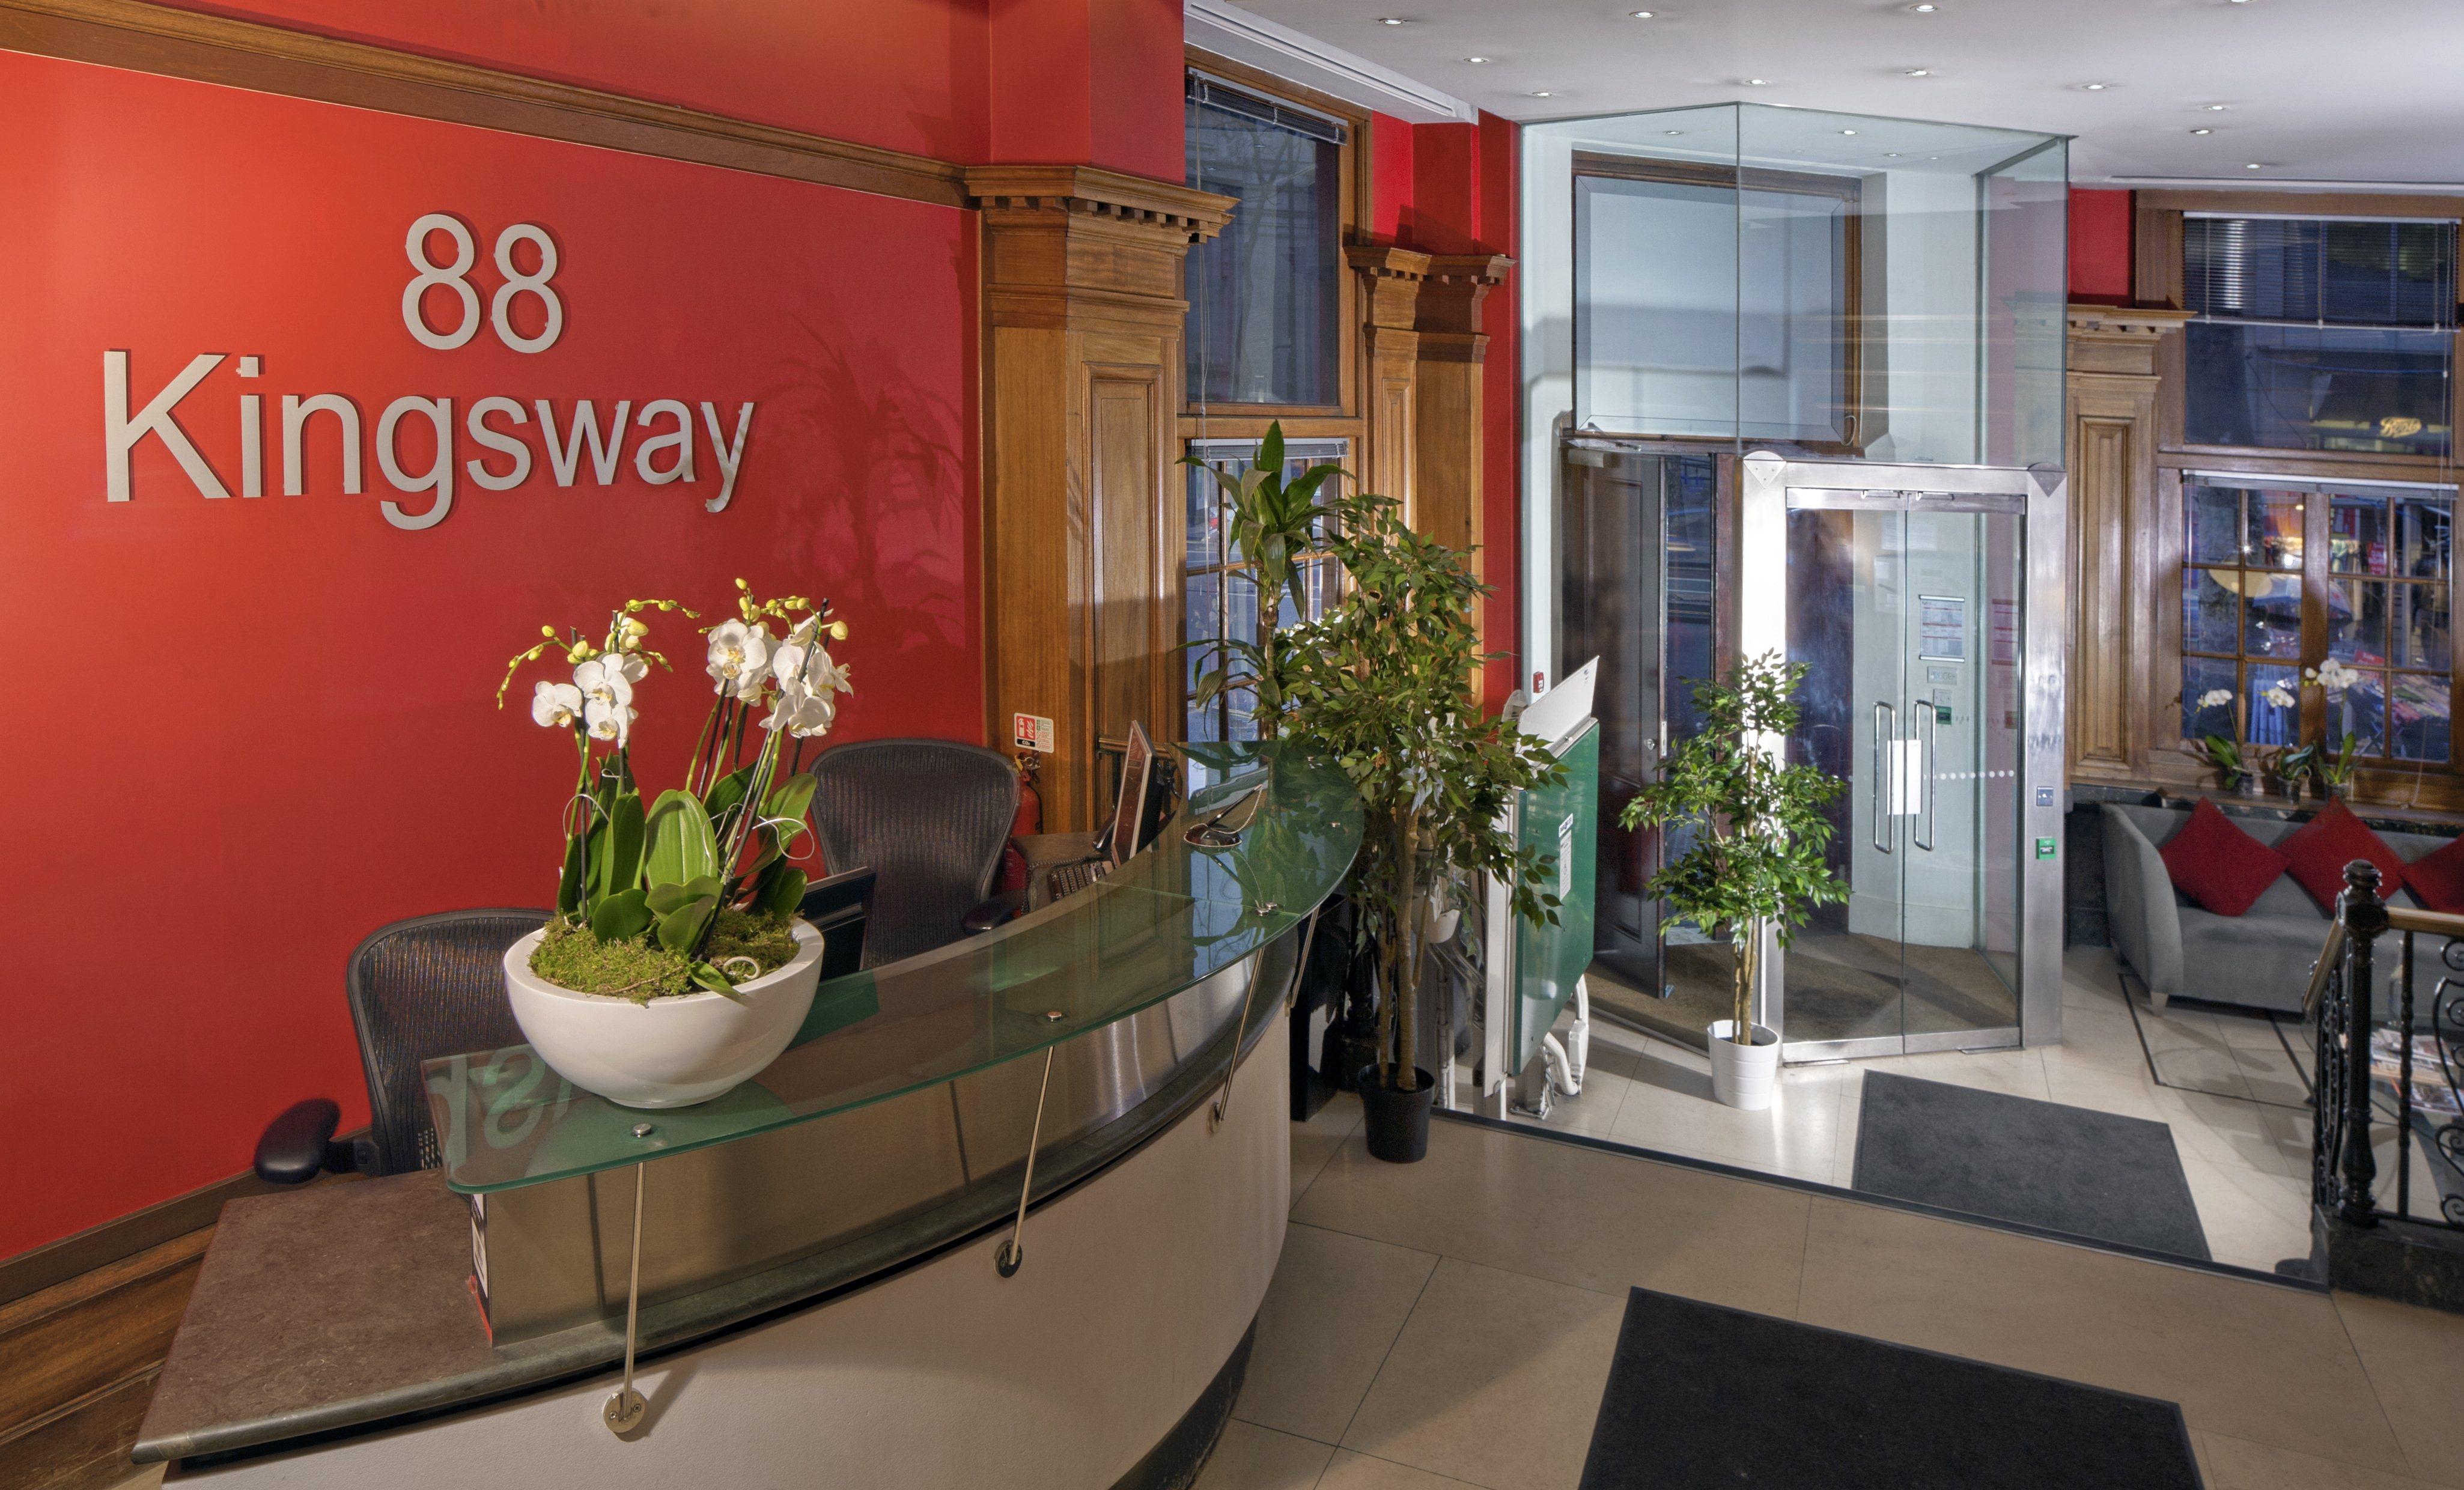 88 Kingsway reception